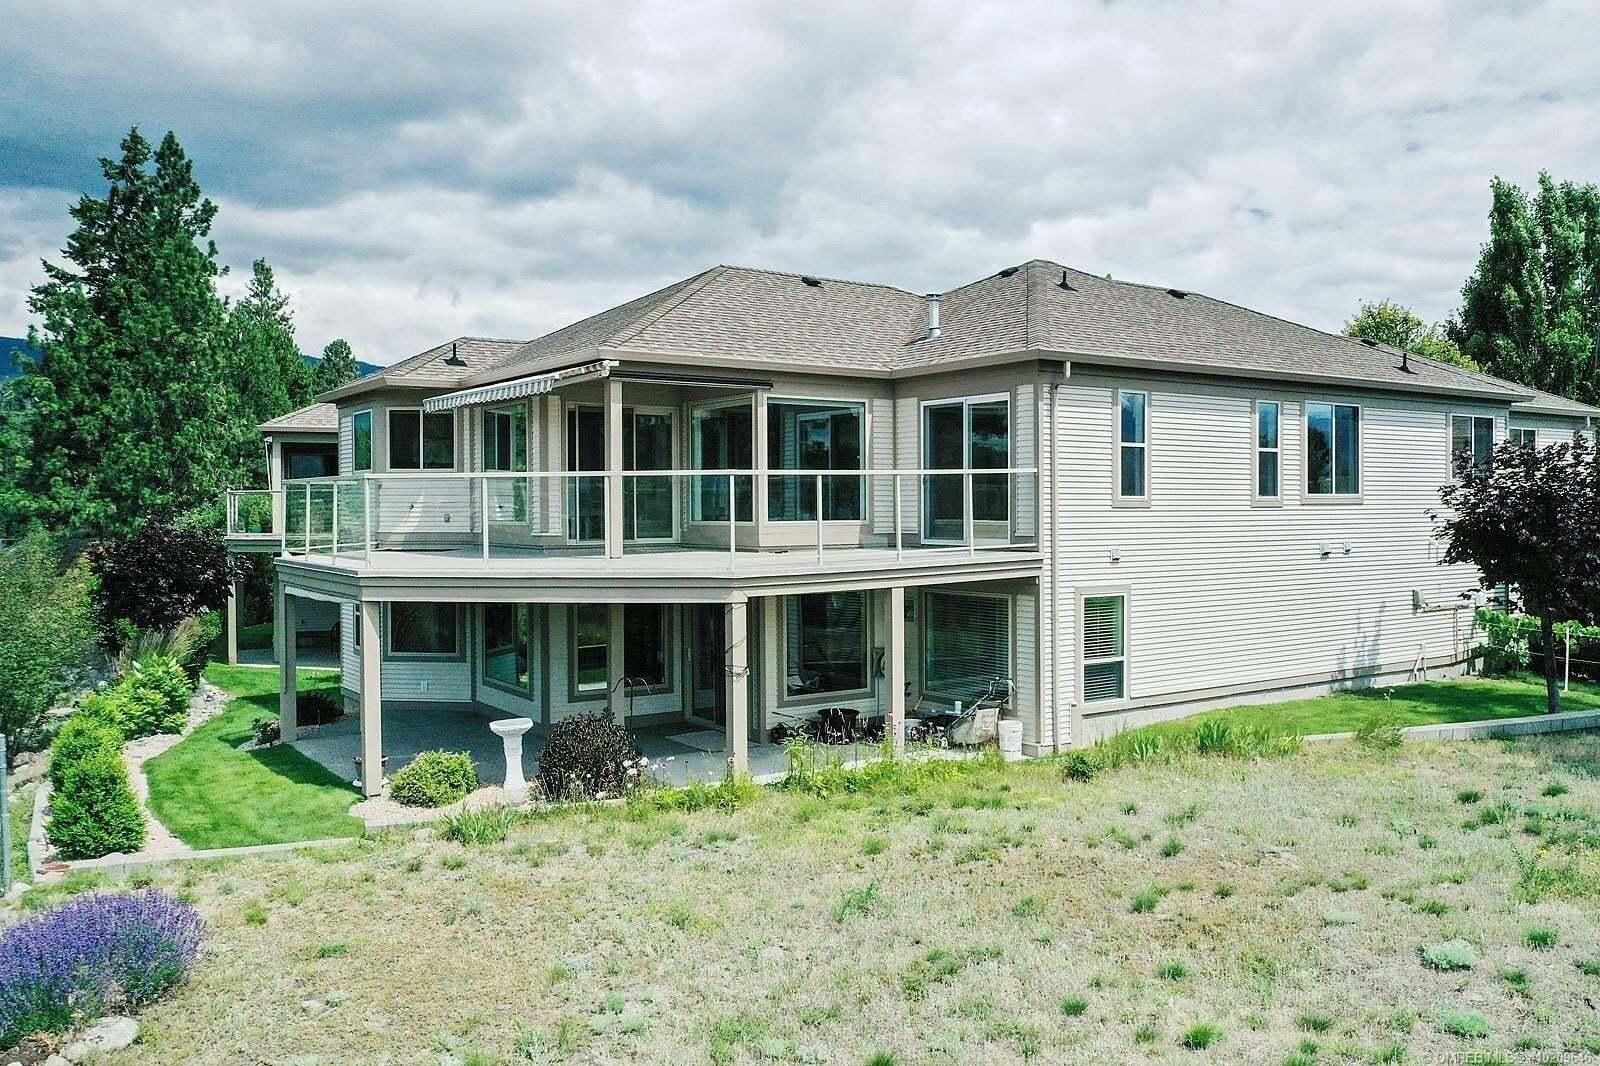 House for sale at 4074 Gellatly Rd West Kelowna British Columbia - MLS: 10209646